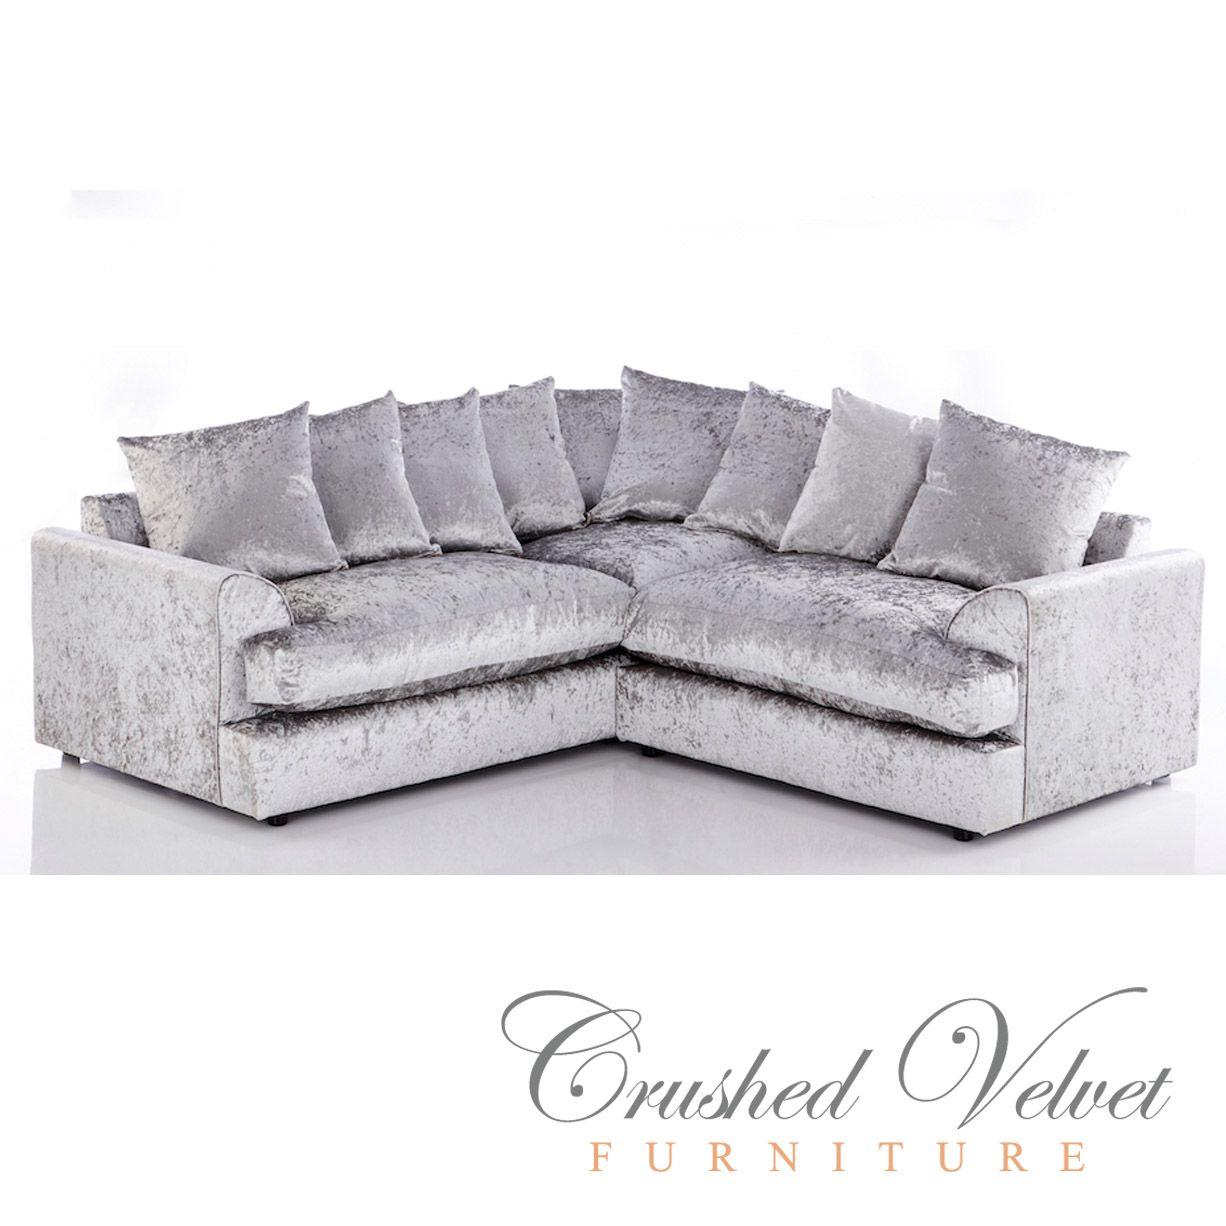 Jasper, Crushed Velvet, 5 Seater Sofa, Silver, Grey, Corner Sofa